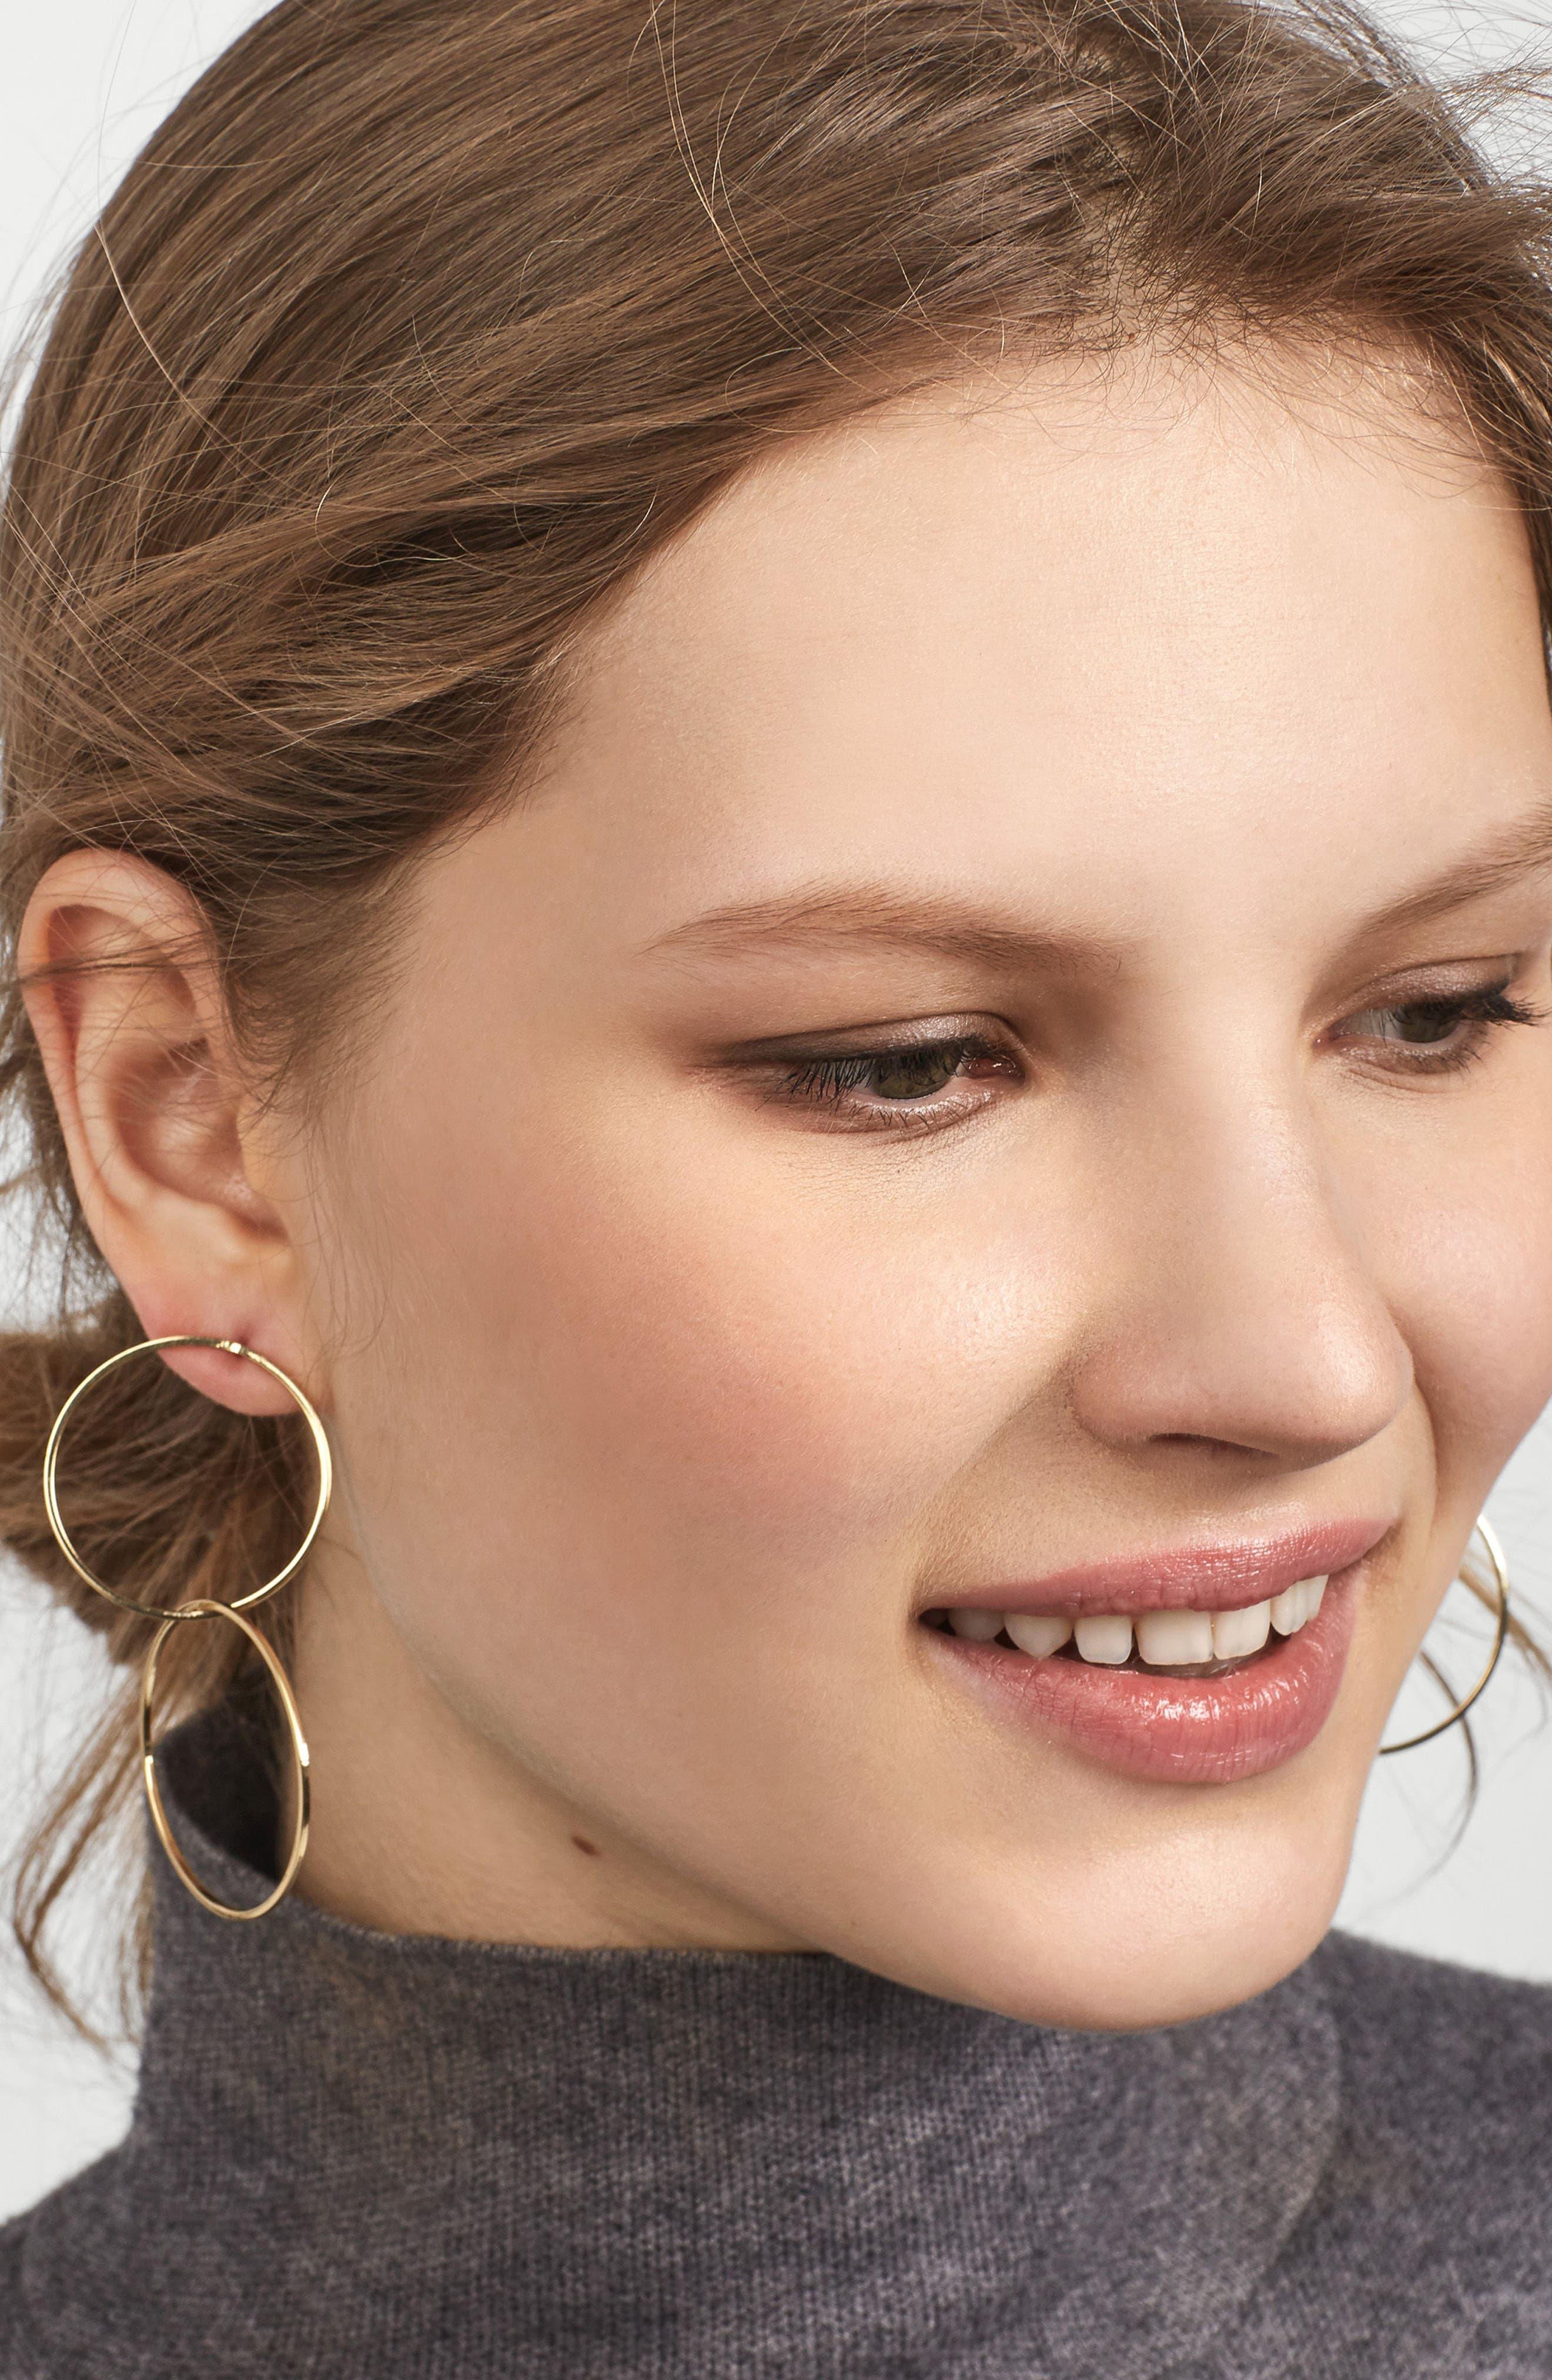 Palace Double Hoop Earrings,                             Alternate thumbnail 2, color,                             Gold